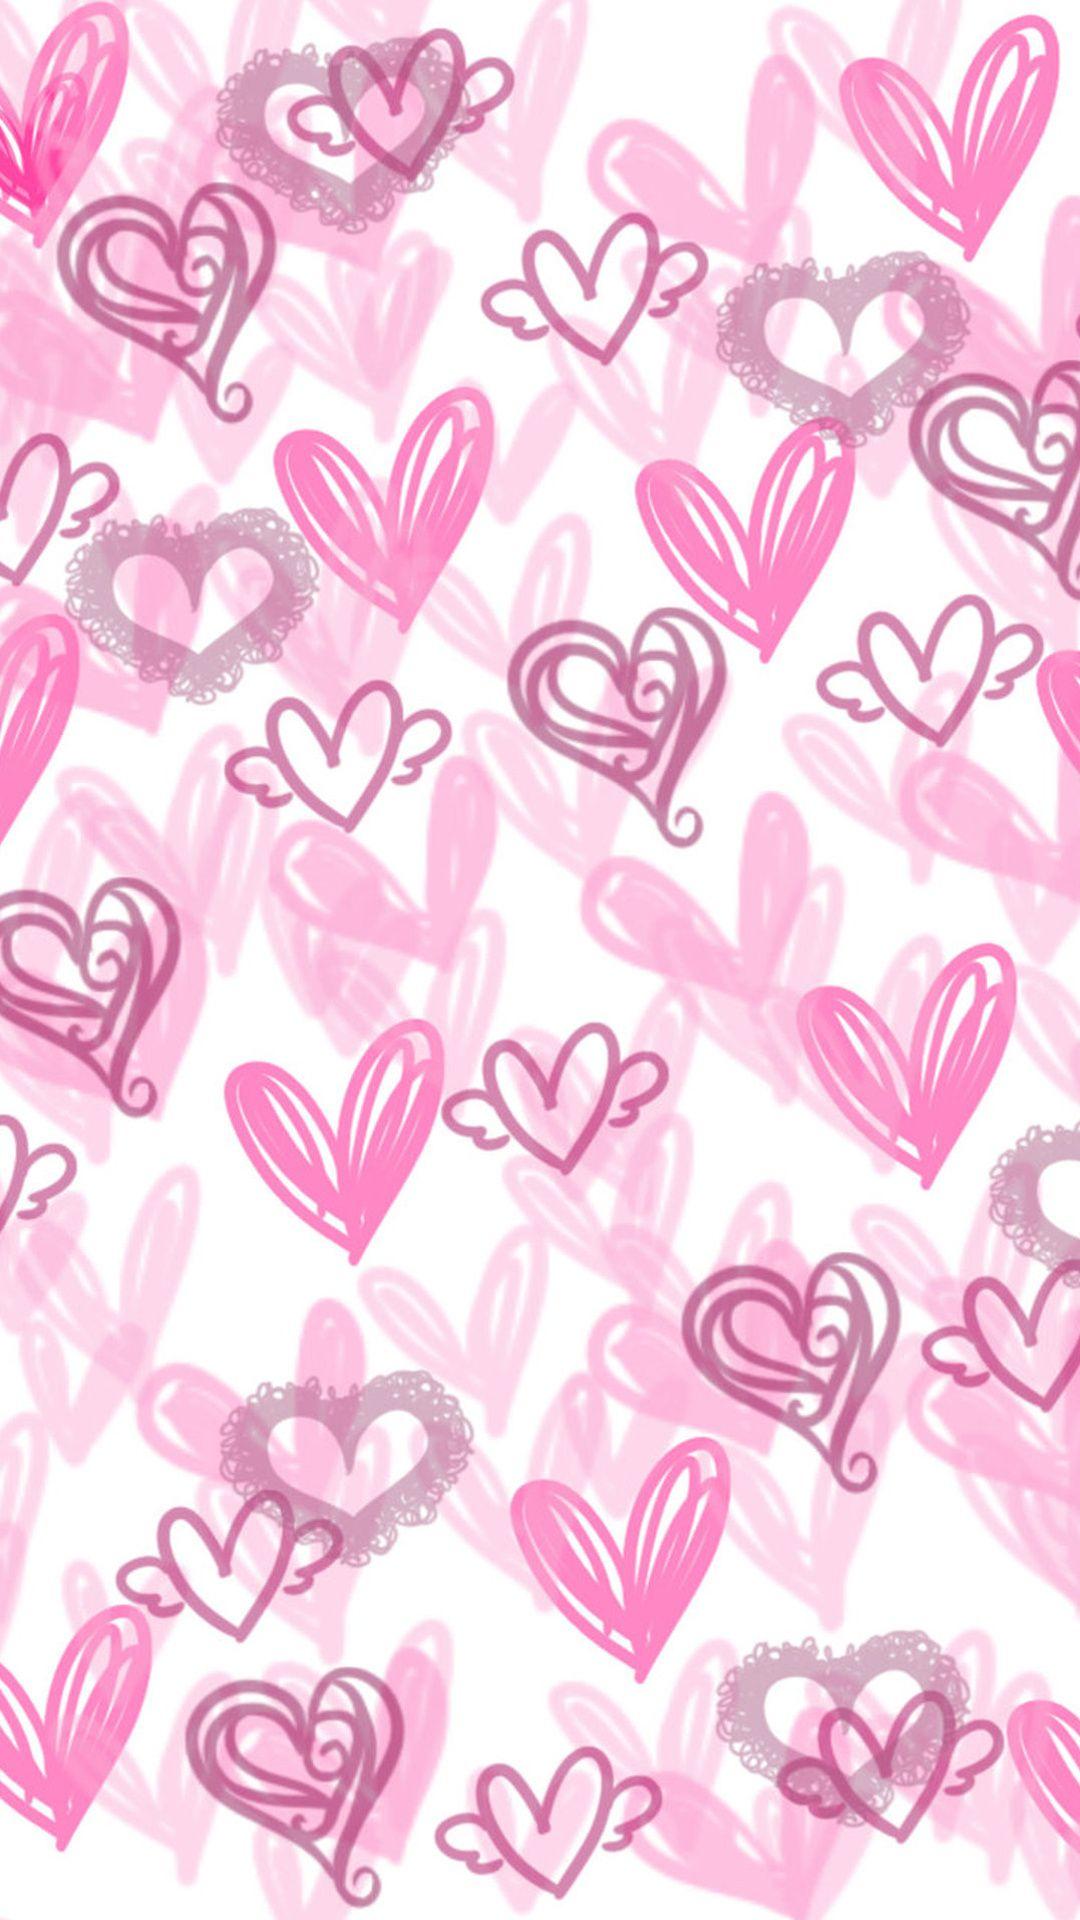 Cute Hearts Wallpaper Backgrounds